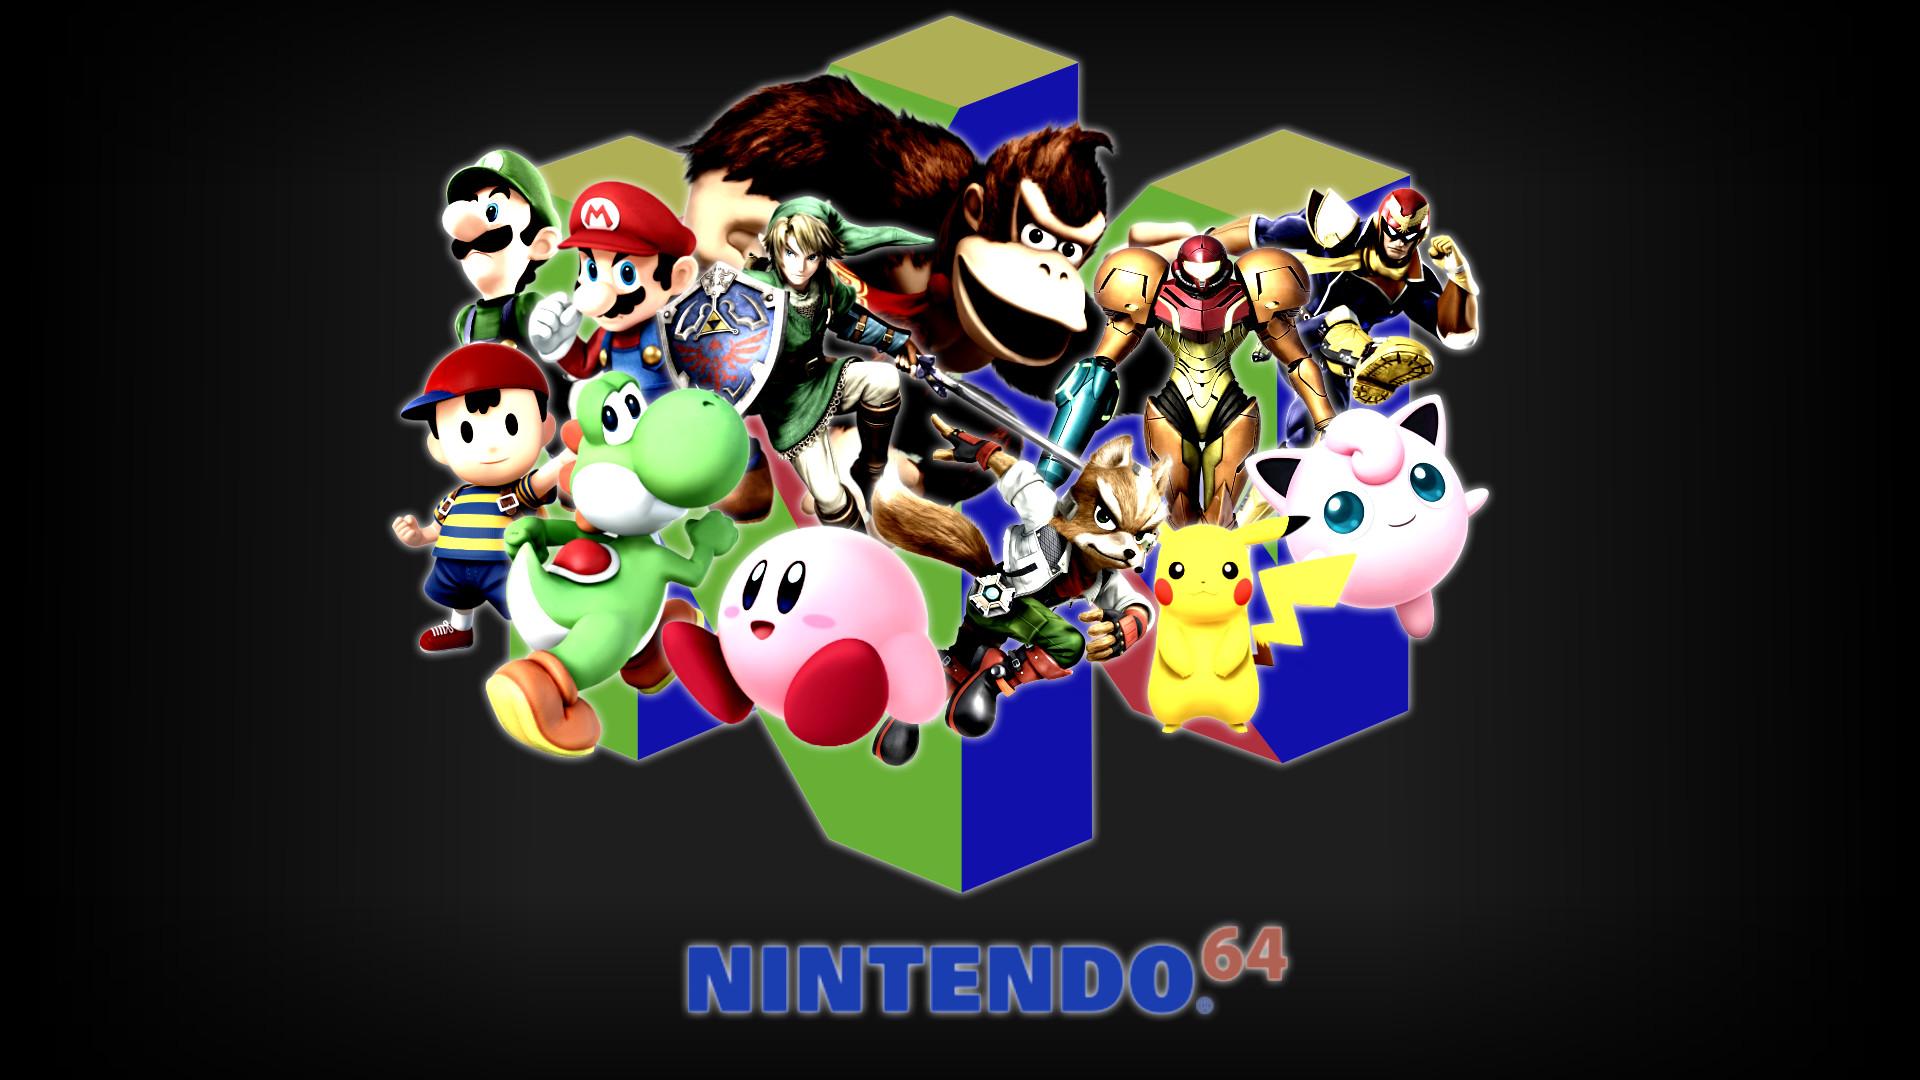 N64 wallpaper